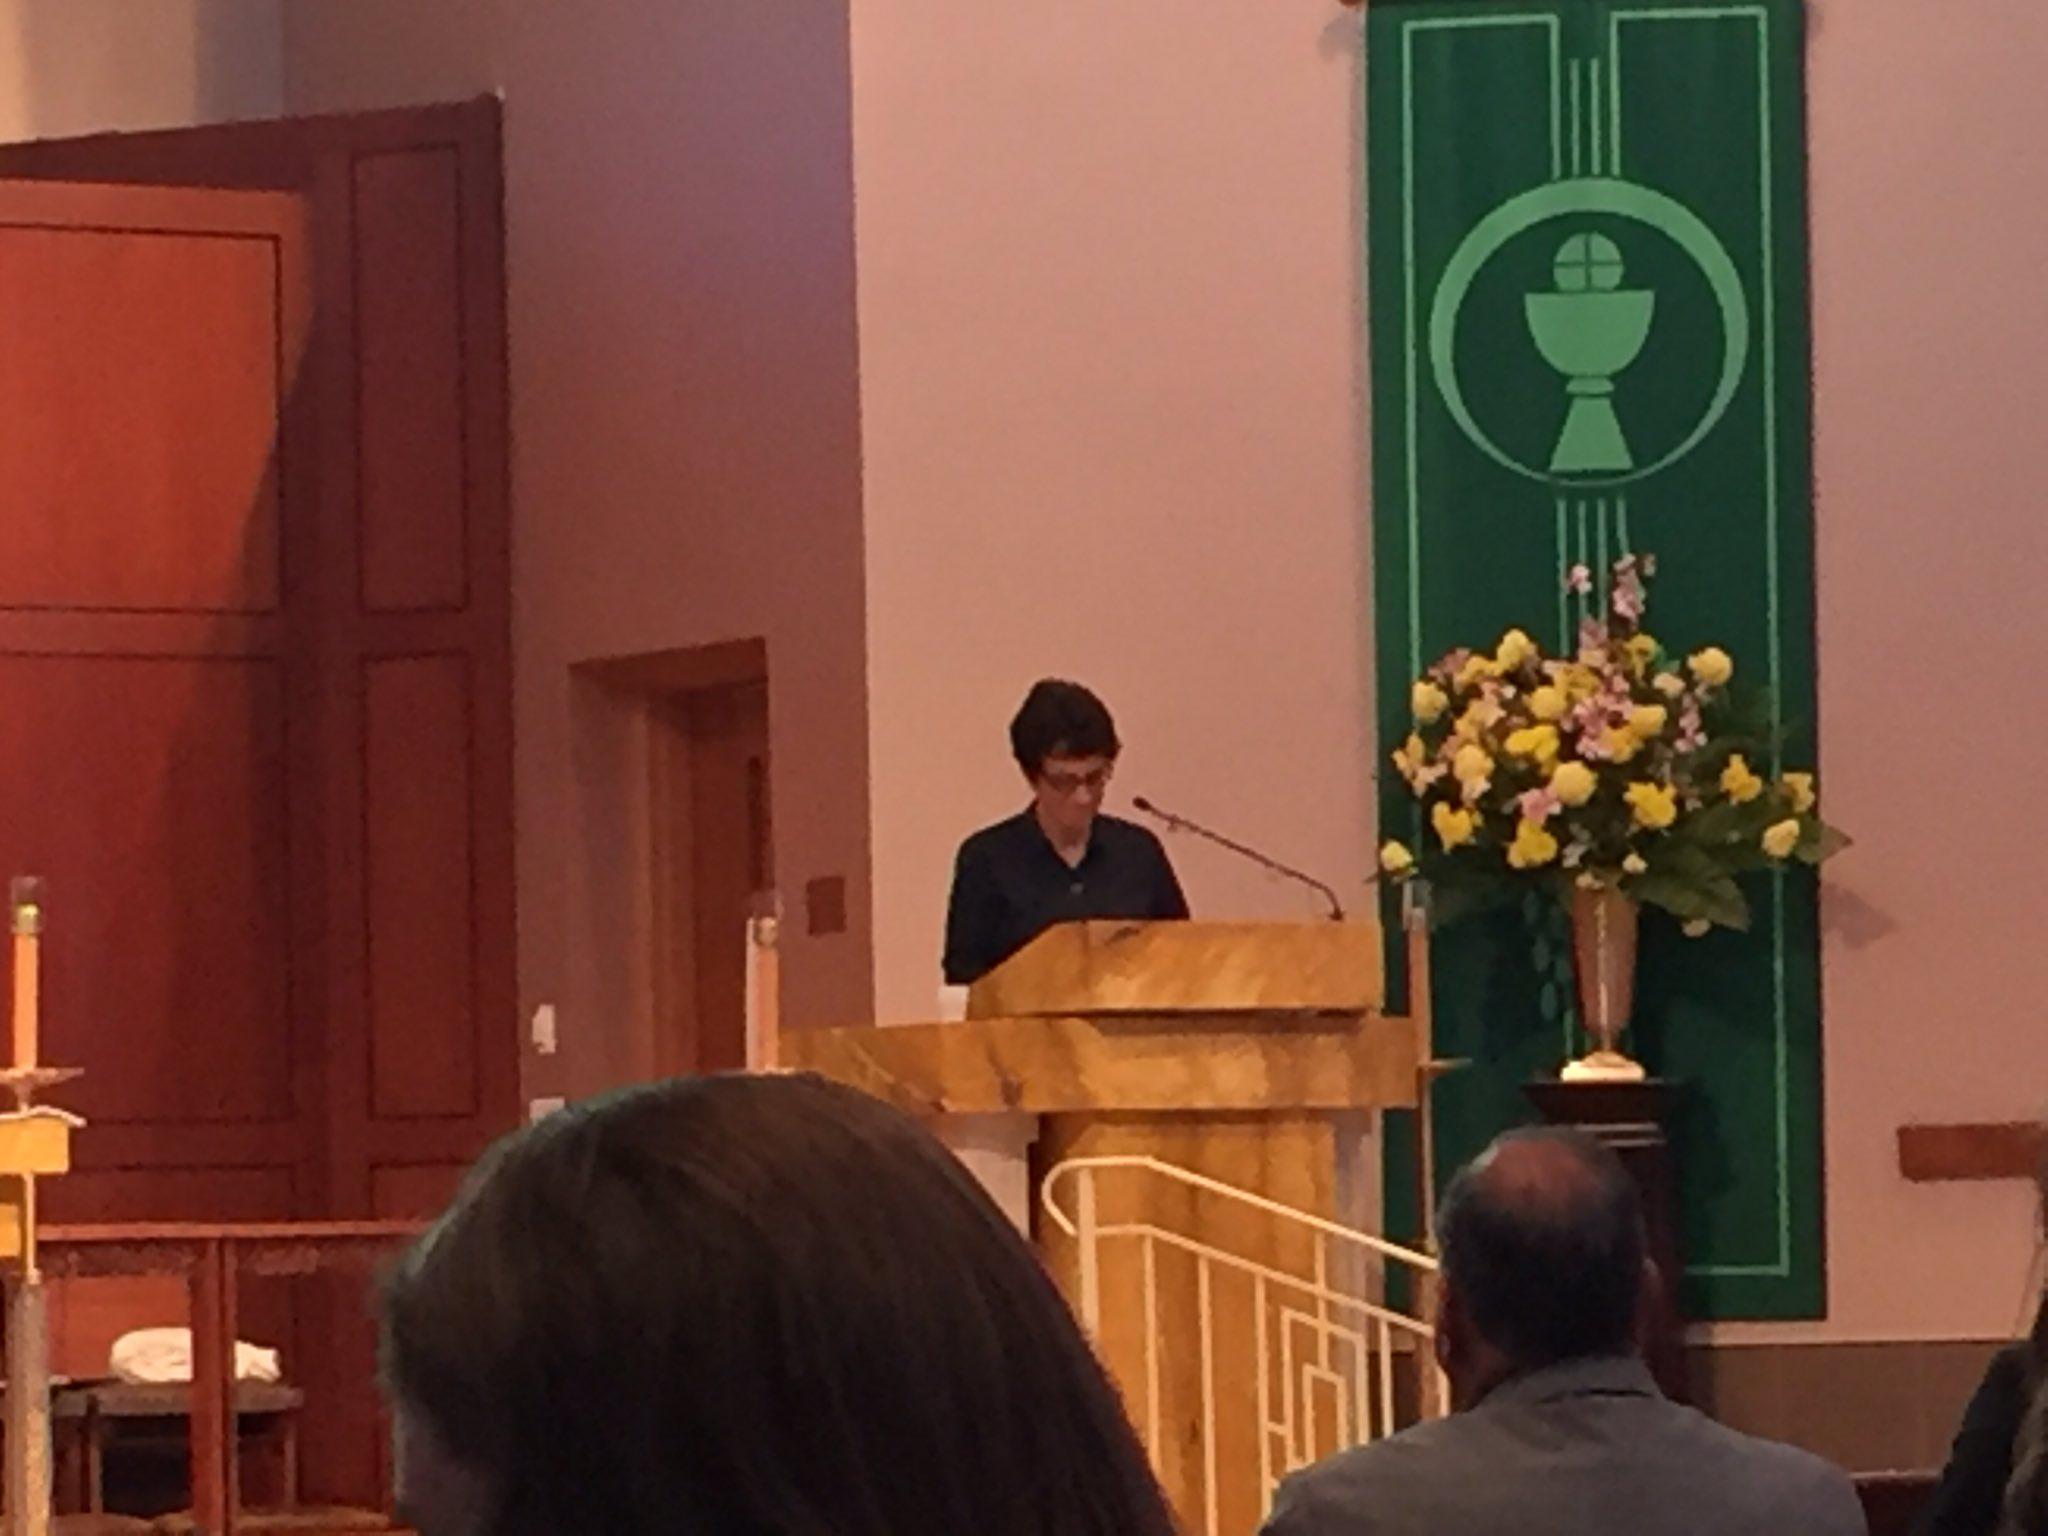 So great to hear @LeMoyne Pres. LeMura at our opening @SyrDiocese @CatholicSchools liturgy! https://t.co/Du3oB74mR7